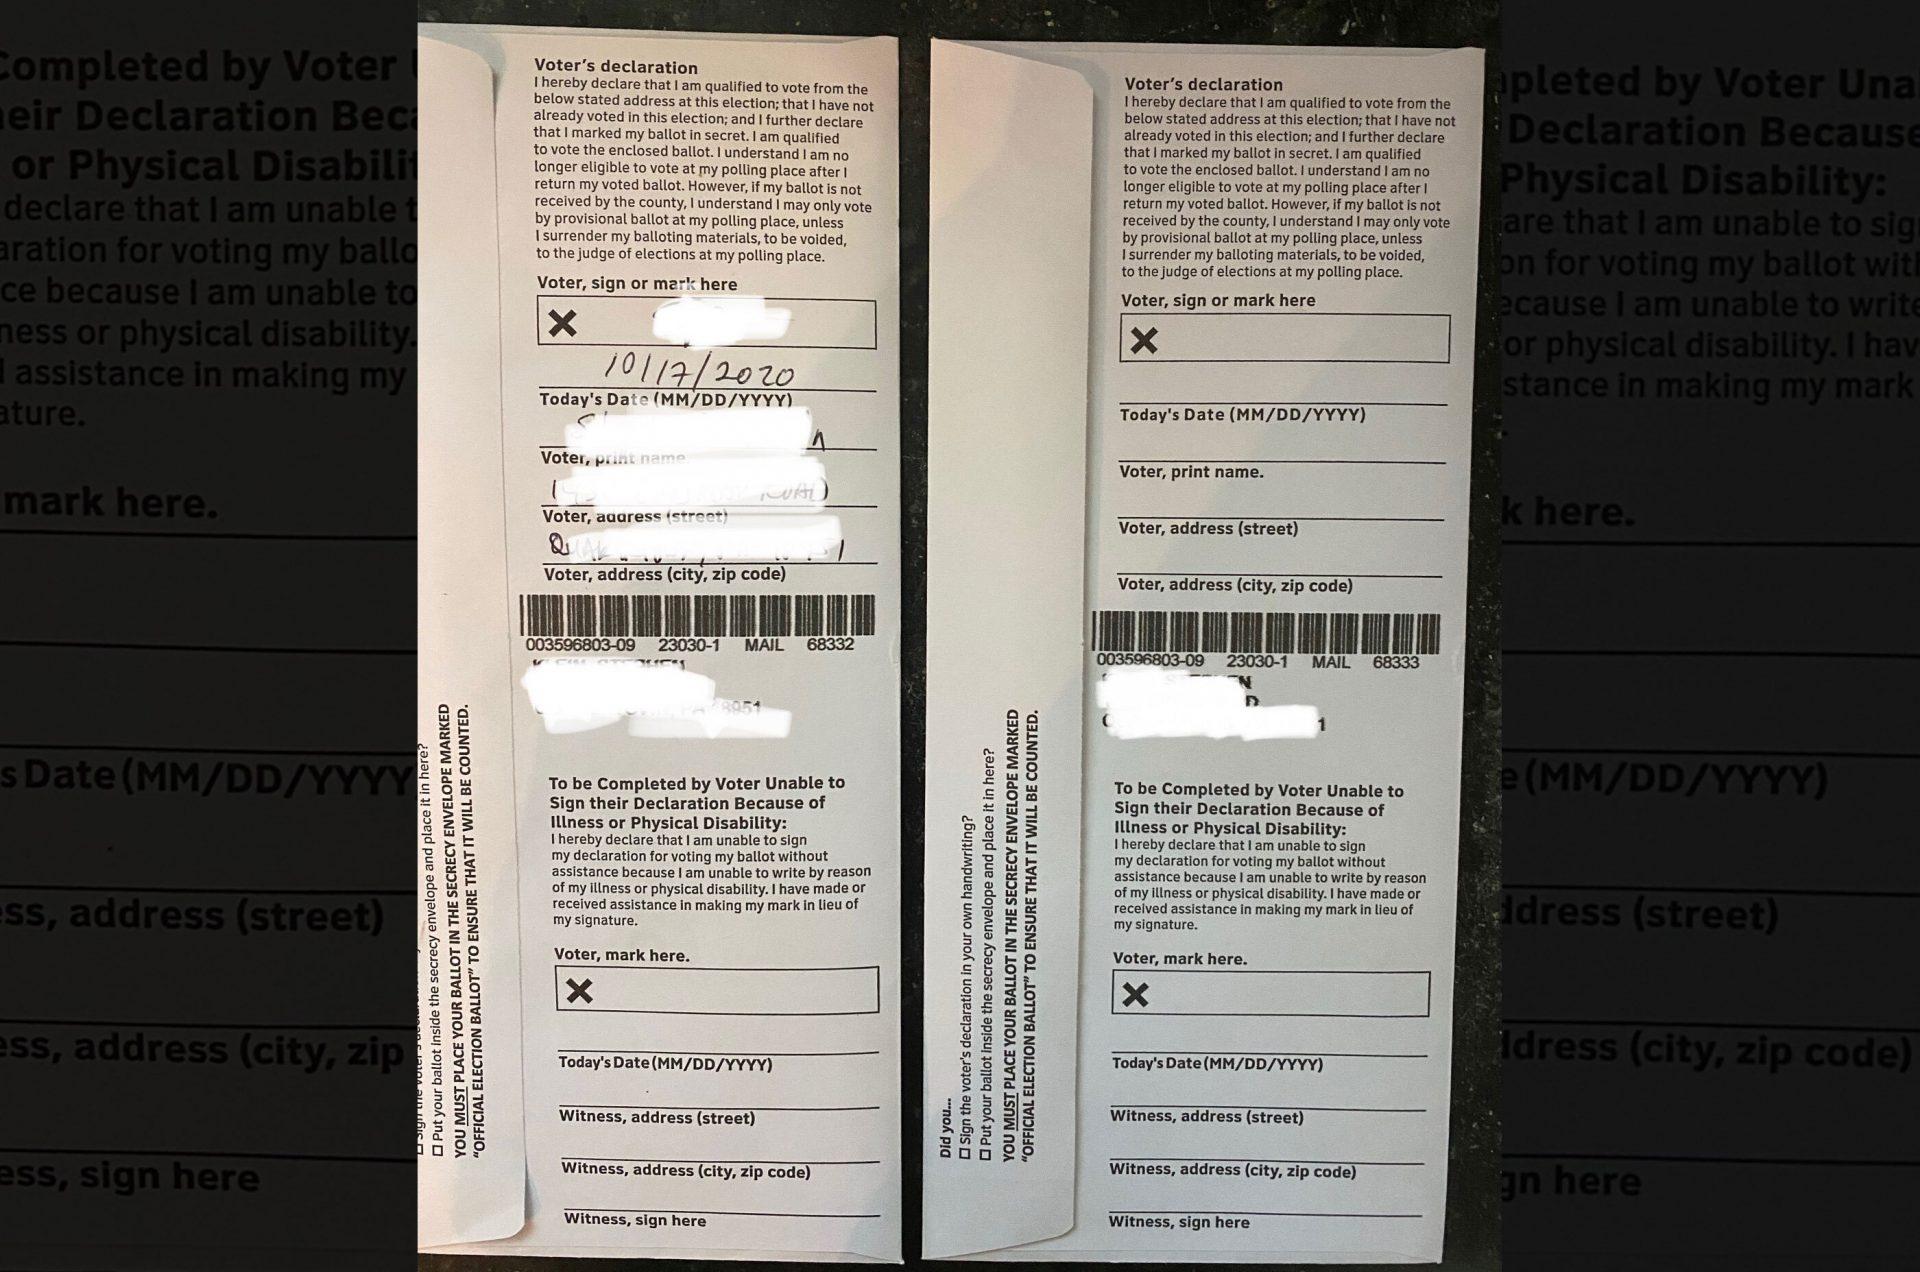 Bucks county voter Stephen Klein's double ballot.